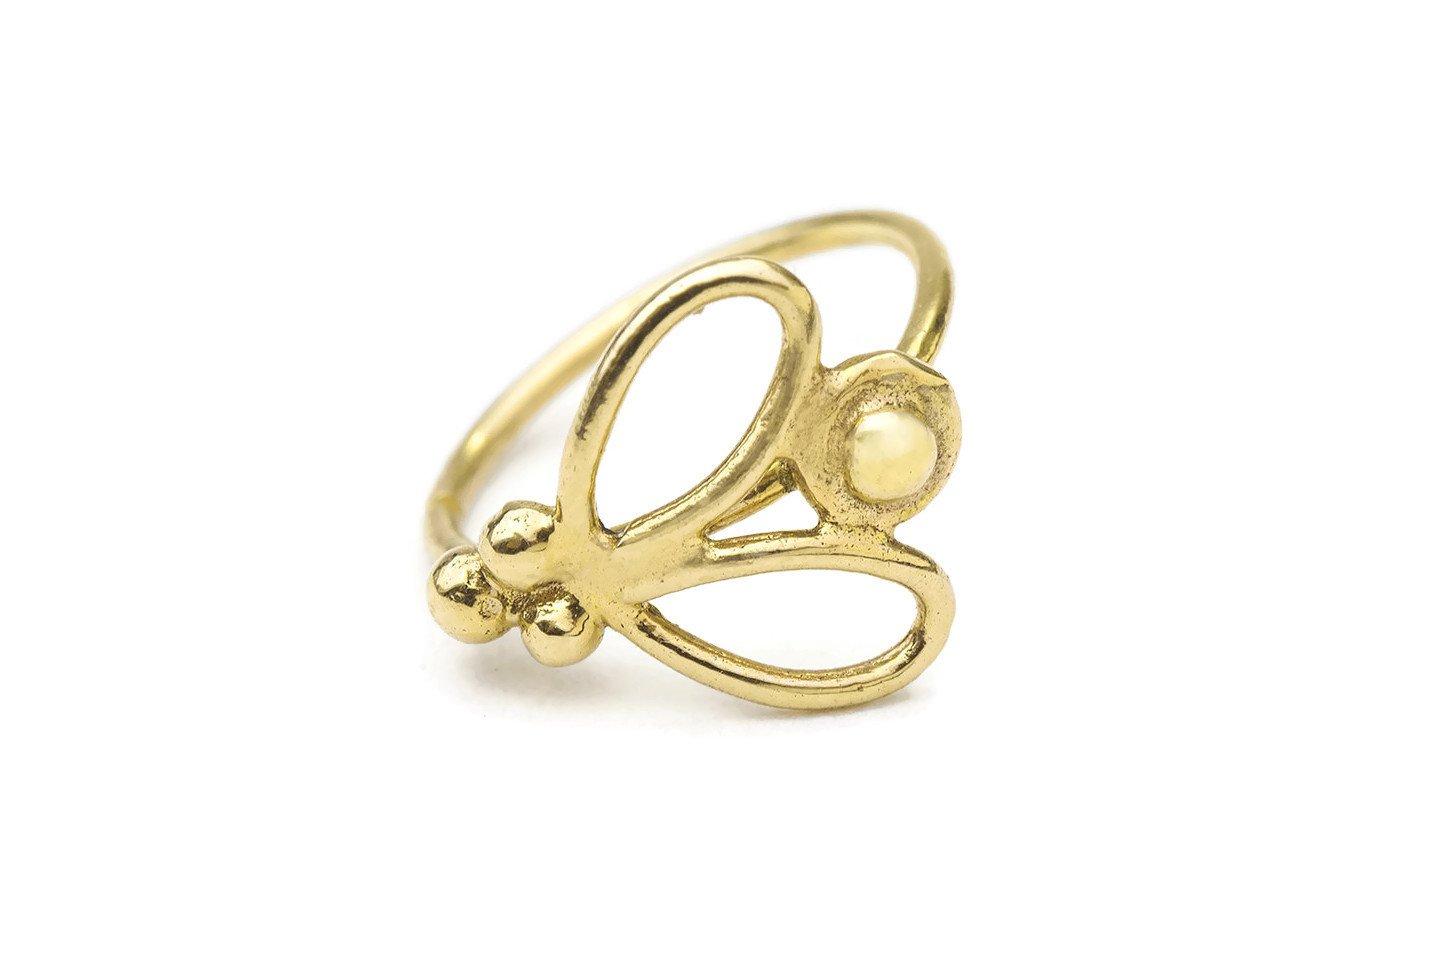 Studio Meme Designer Handmade Nose Rings available in Solid 14k Yellow Gold 16 Gauge 7-9mm